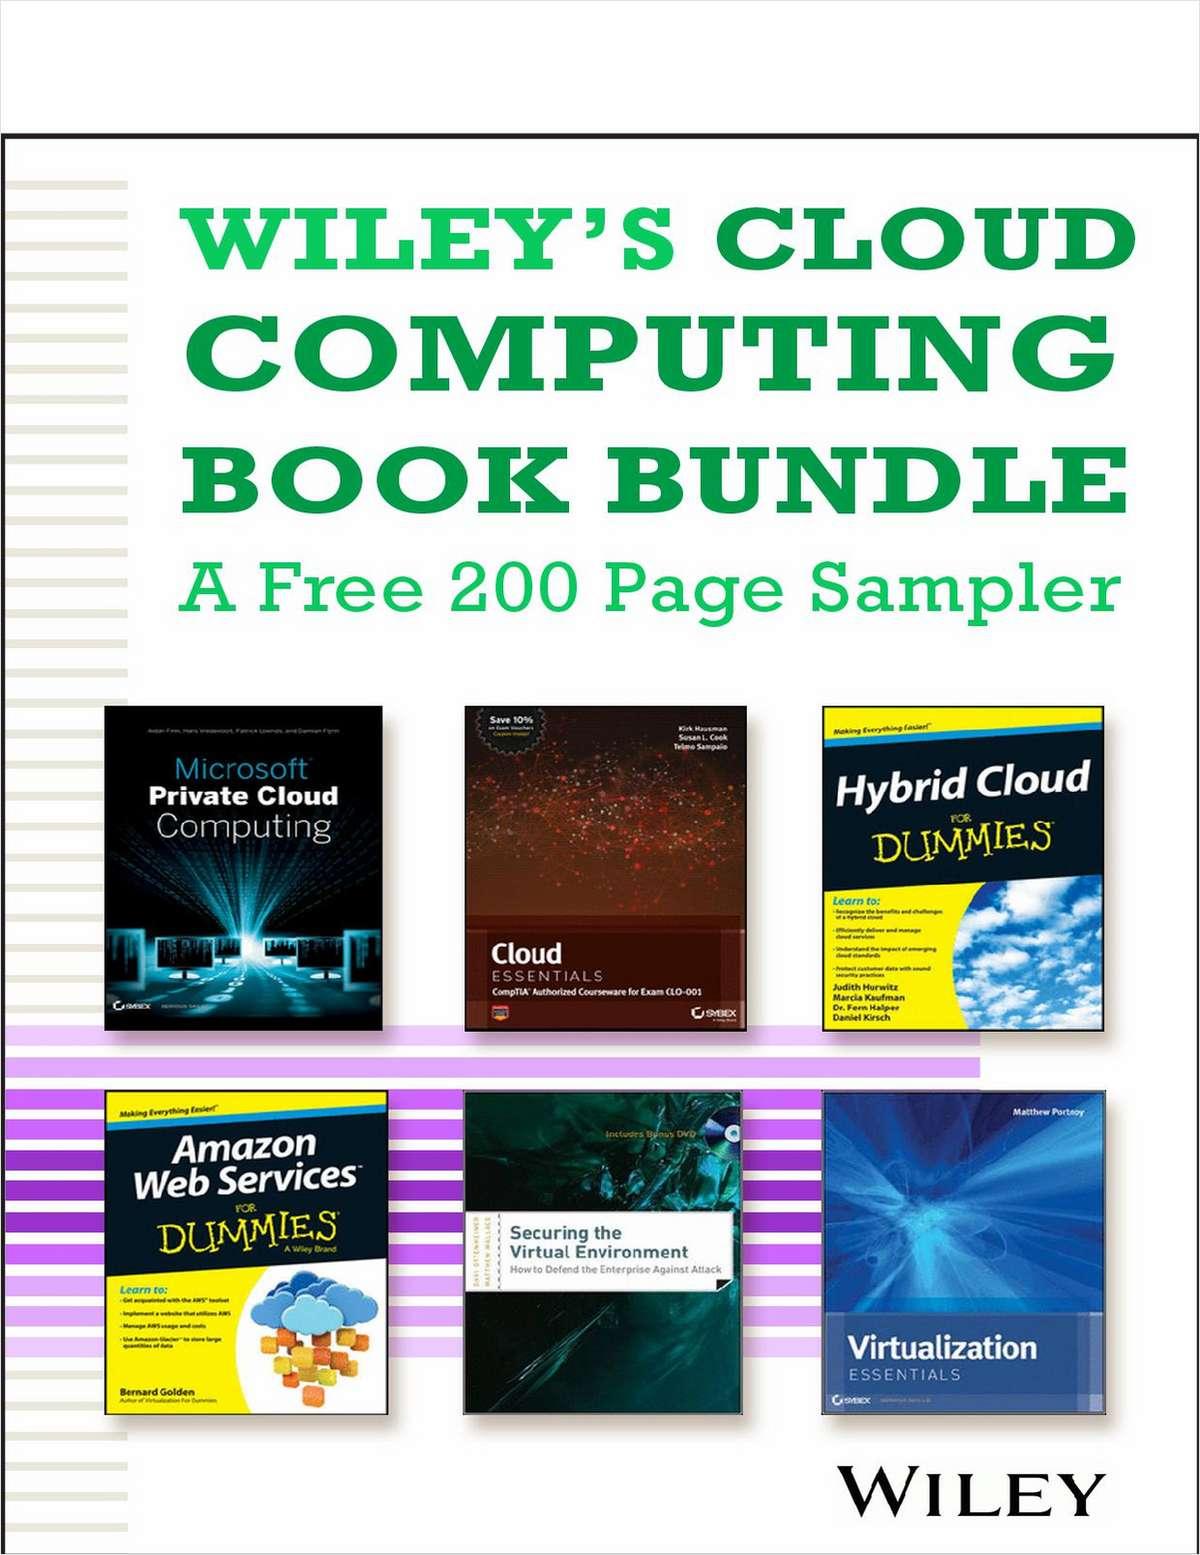 Wiley's Cloud Computing Book Bundle -- A Free 200 Page Sampler